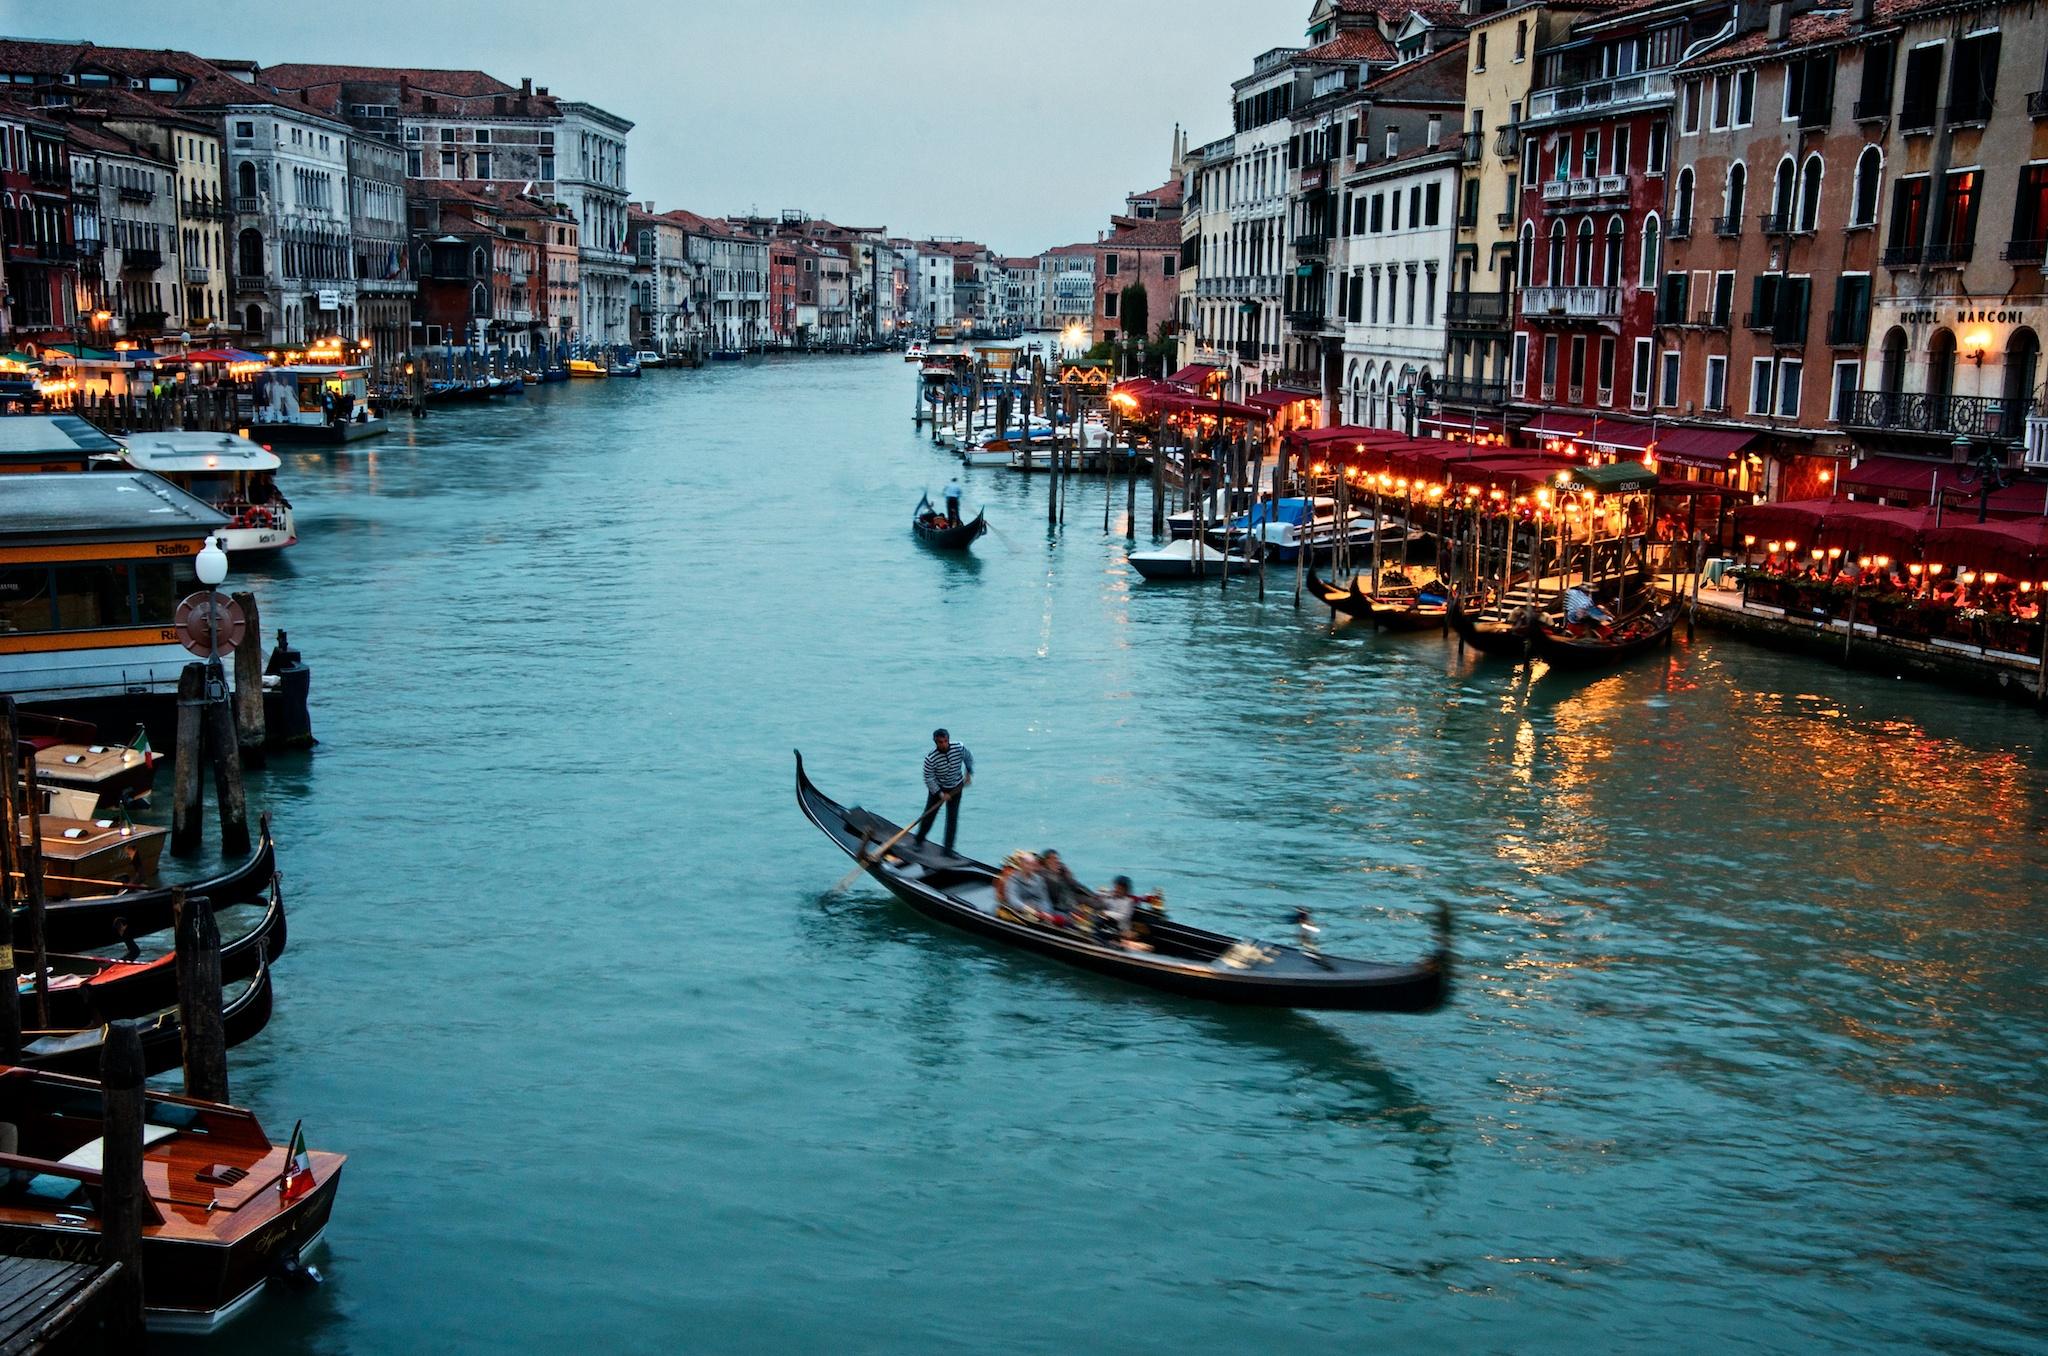 Last Night In Venice  Purchase a print